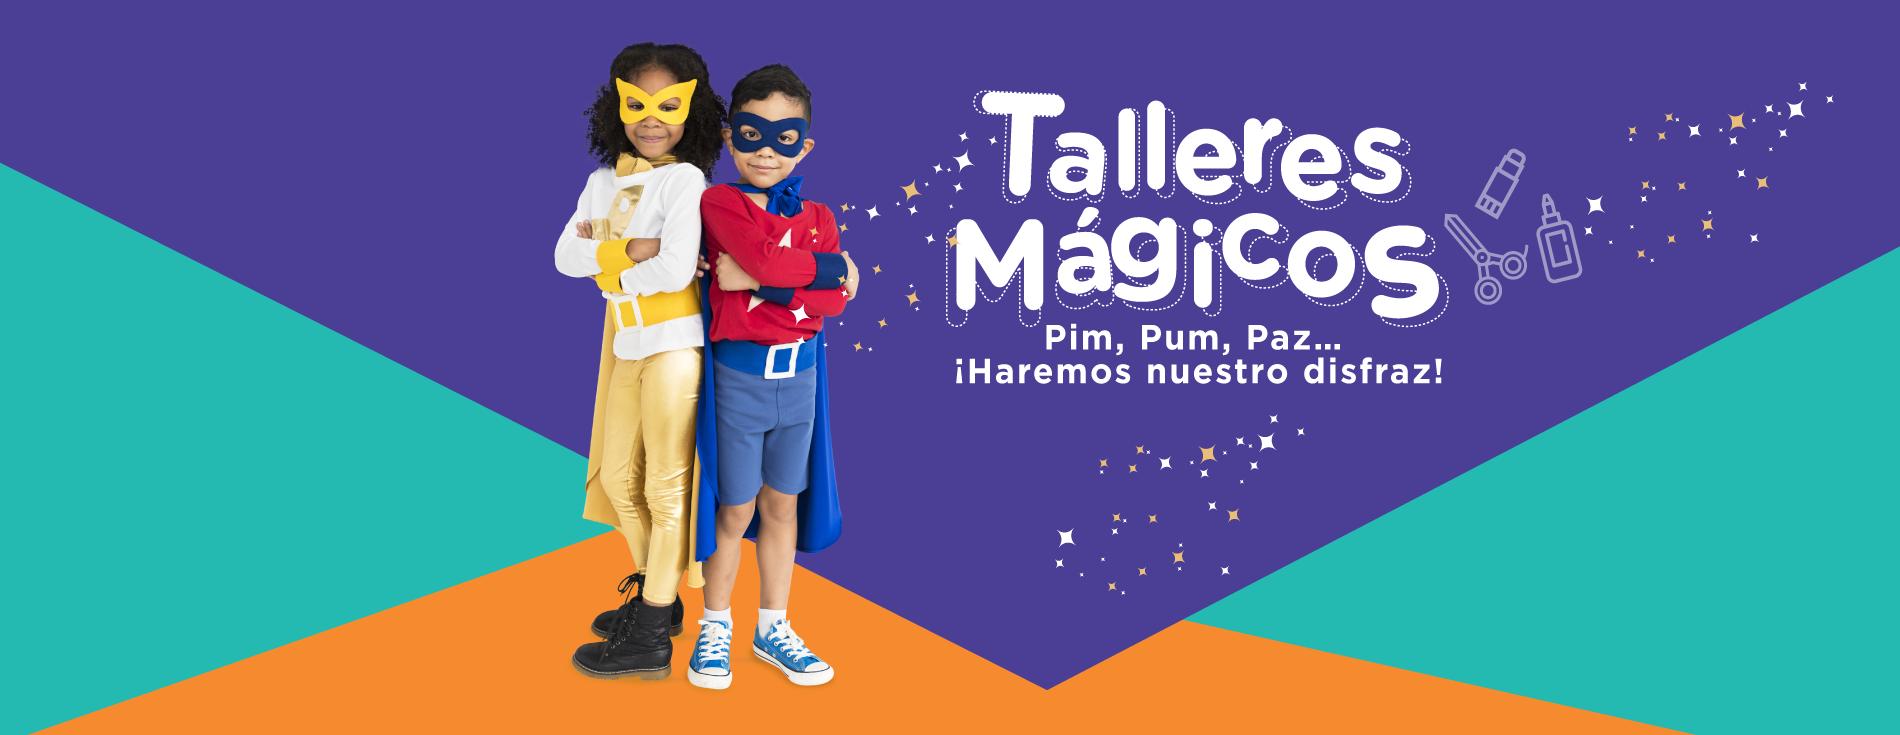 Talleres mágicos - Buenaventura